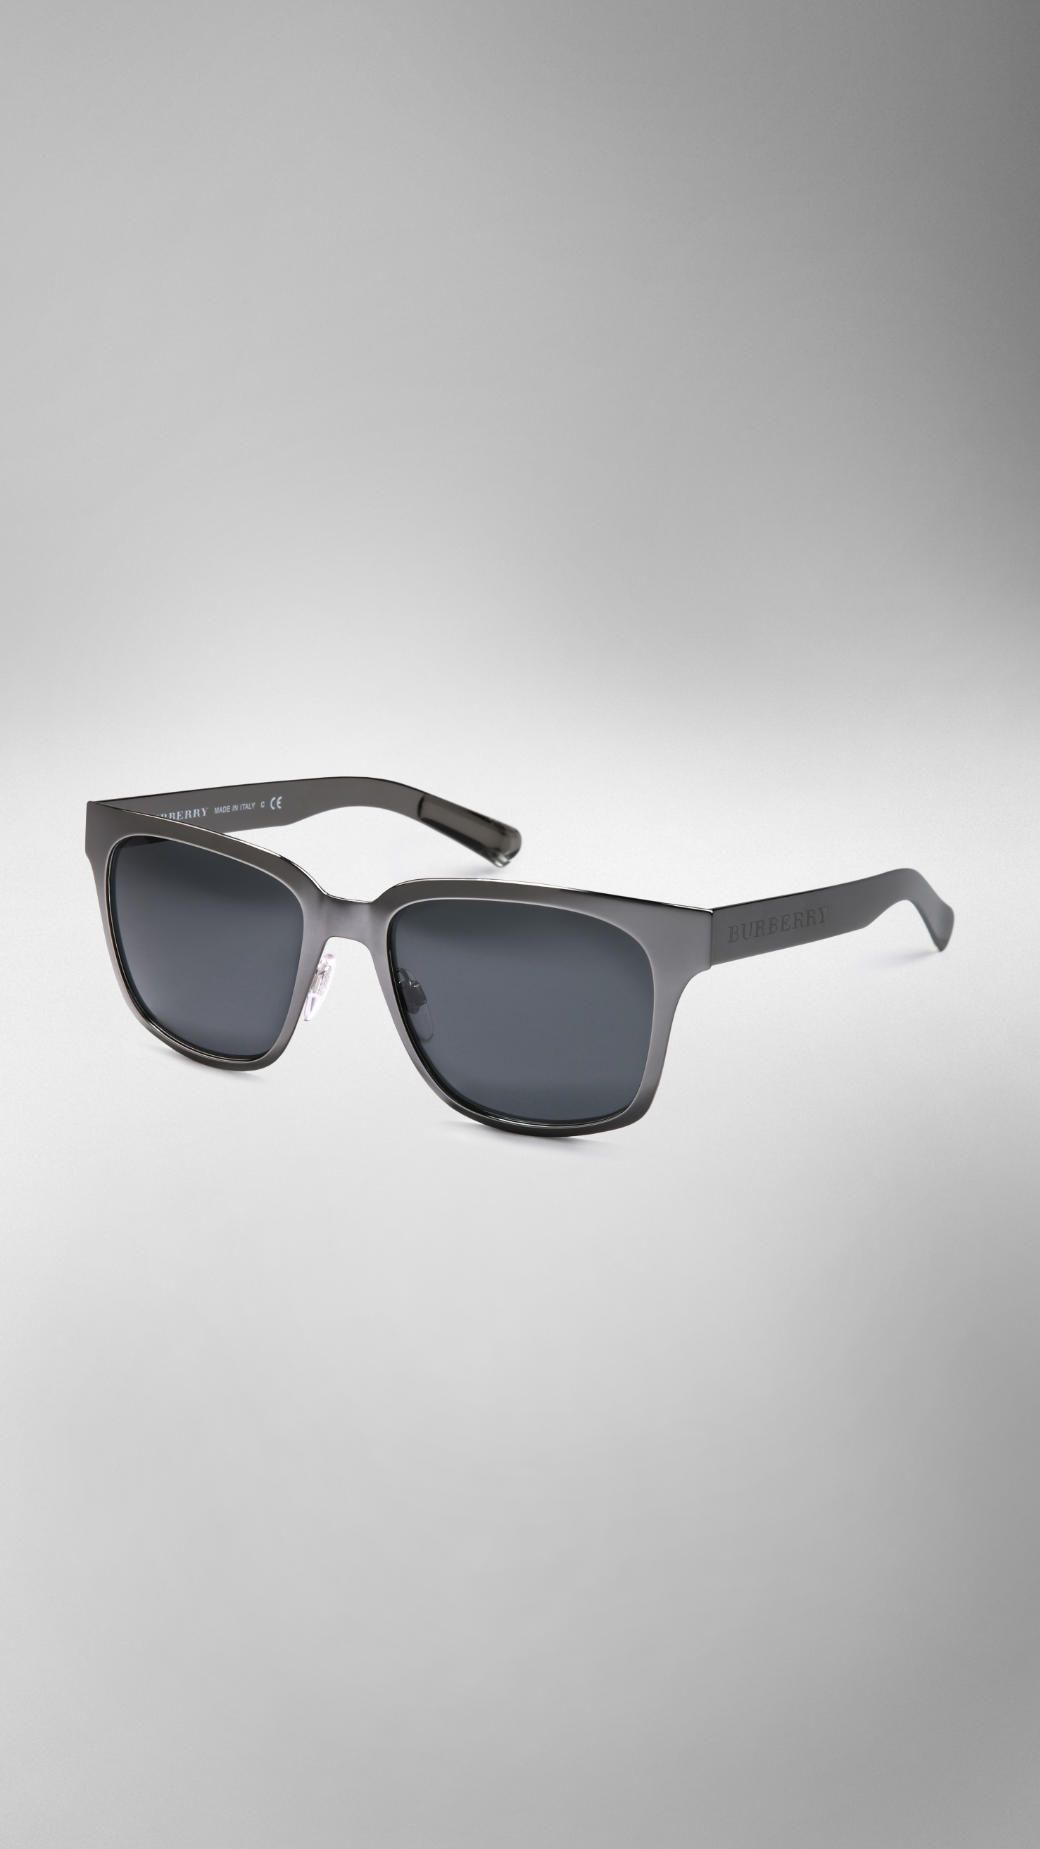 7aa4527a063c Splash Sunglasses in a Metallic Finish